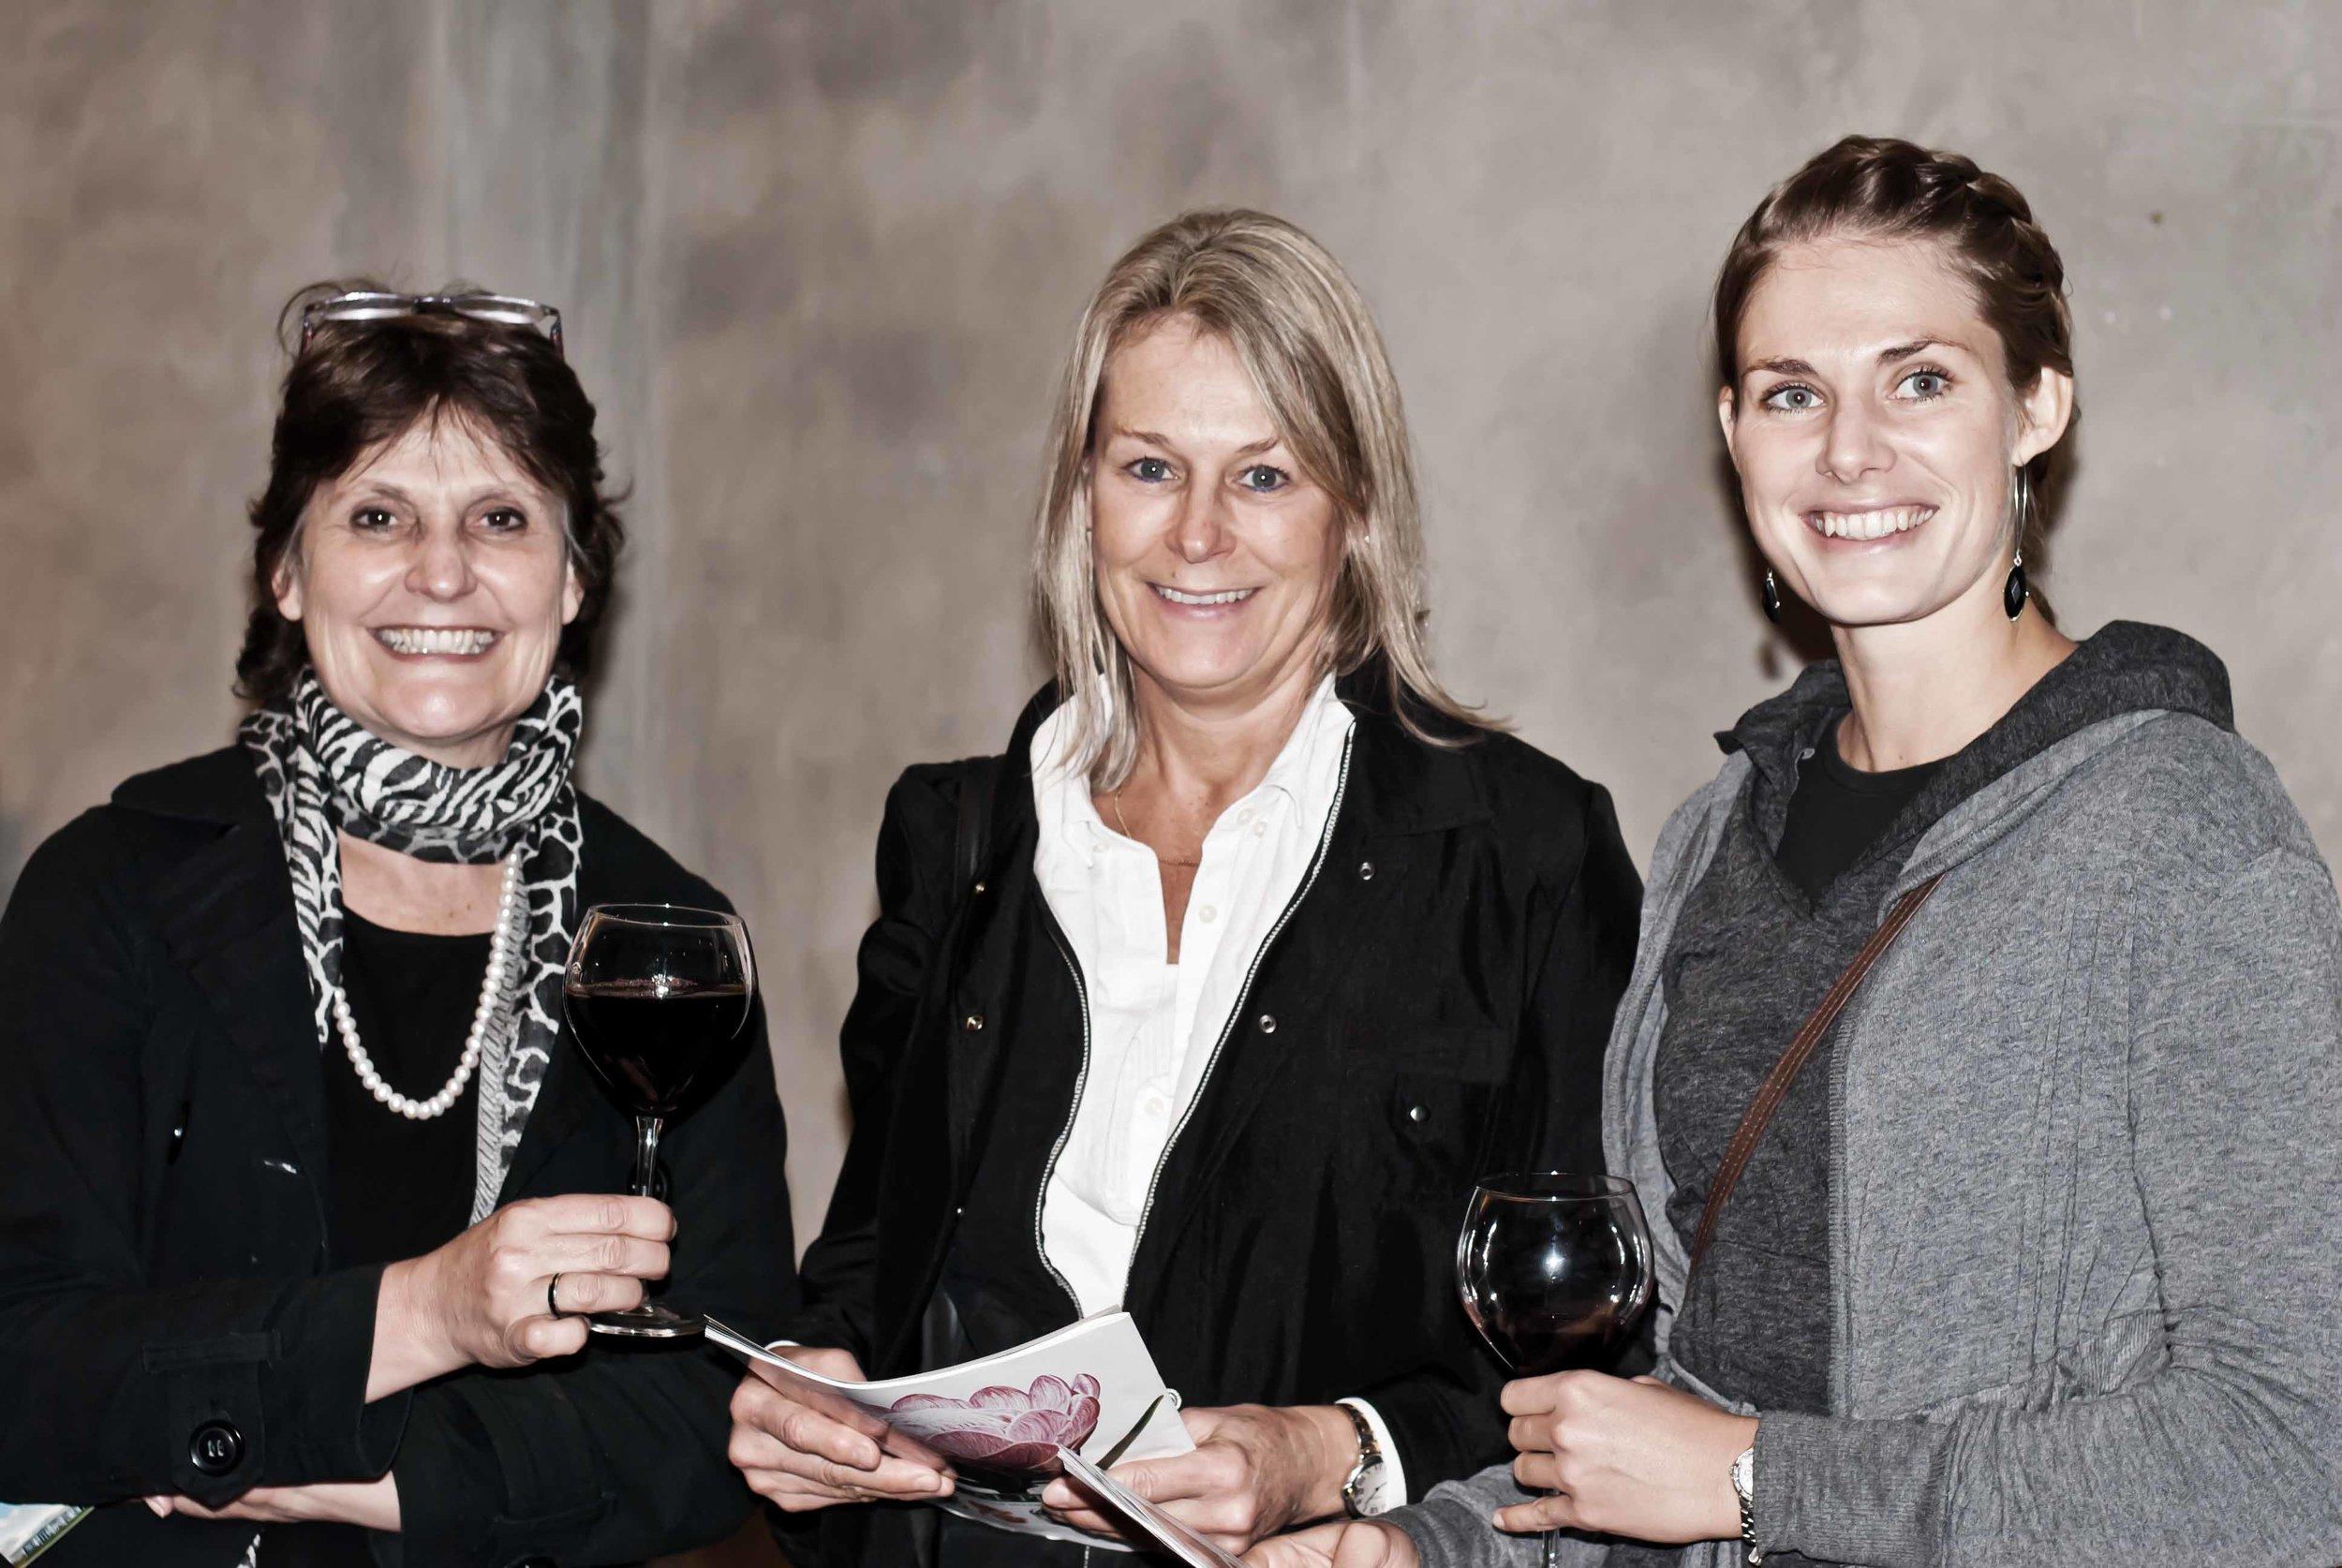 Susina Jooste, Mareli Visser & Sumi Jooste.jpg